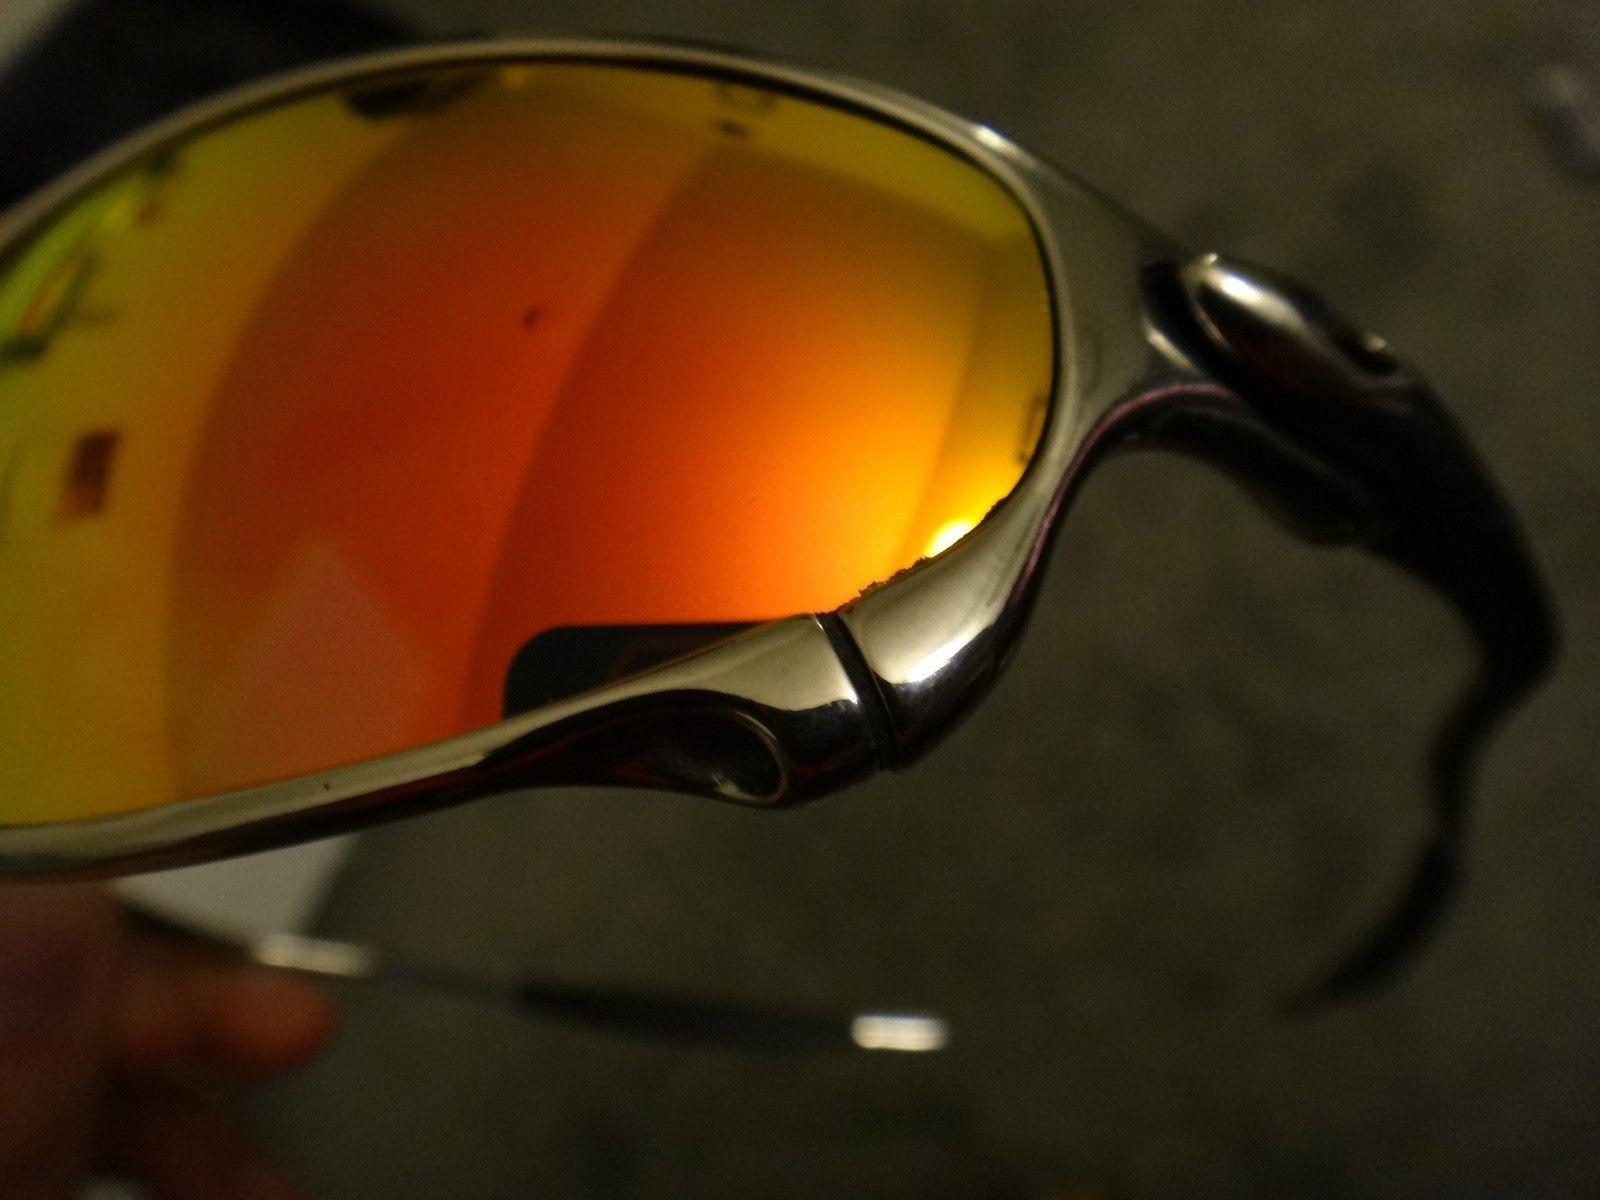 Polished juliet w/ fire iridium polarized lens $365 contUS - DSC07479.JPG